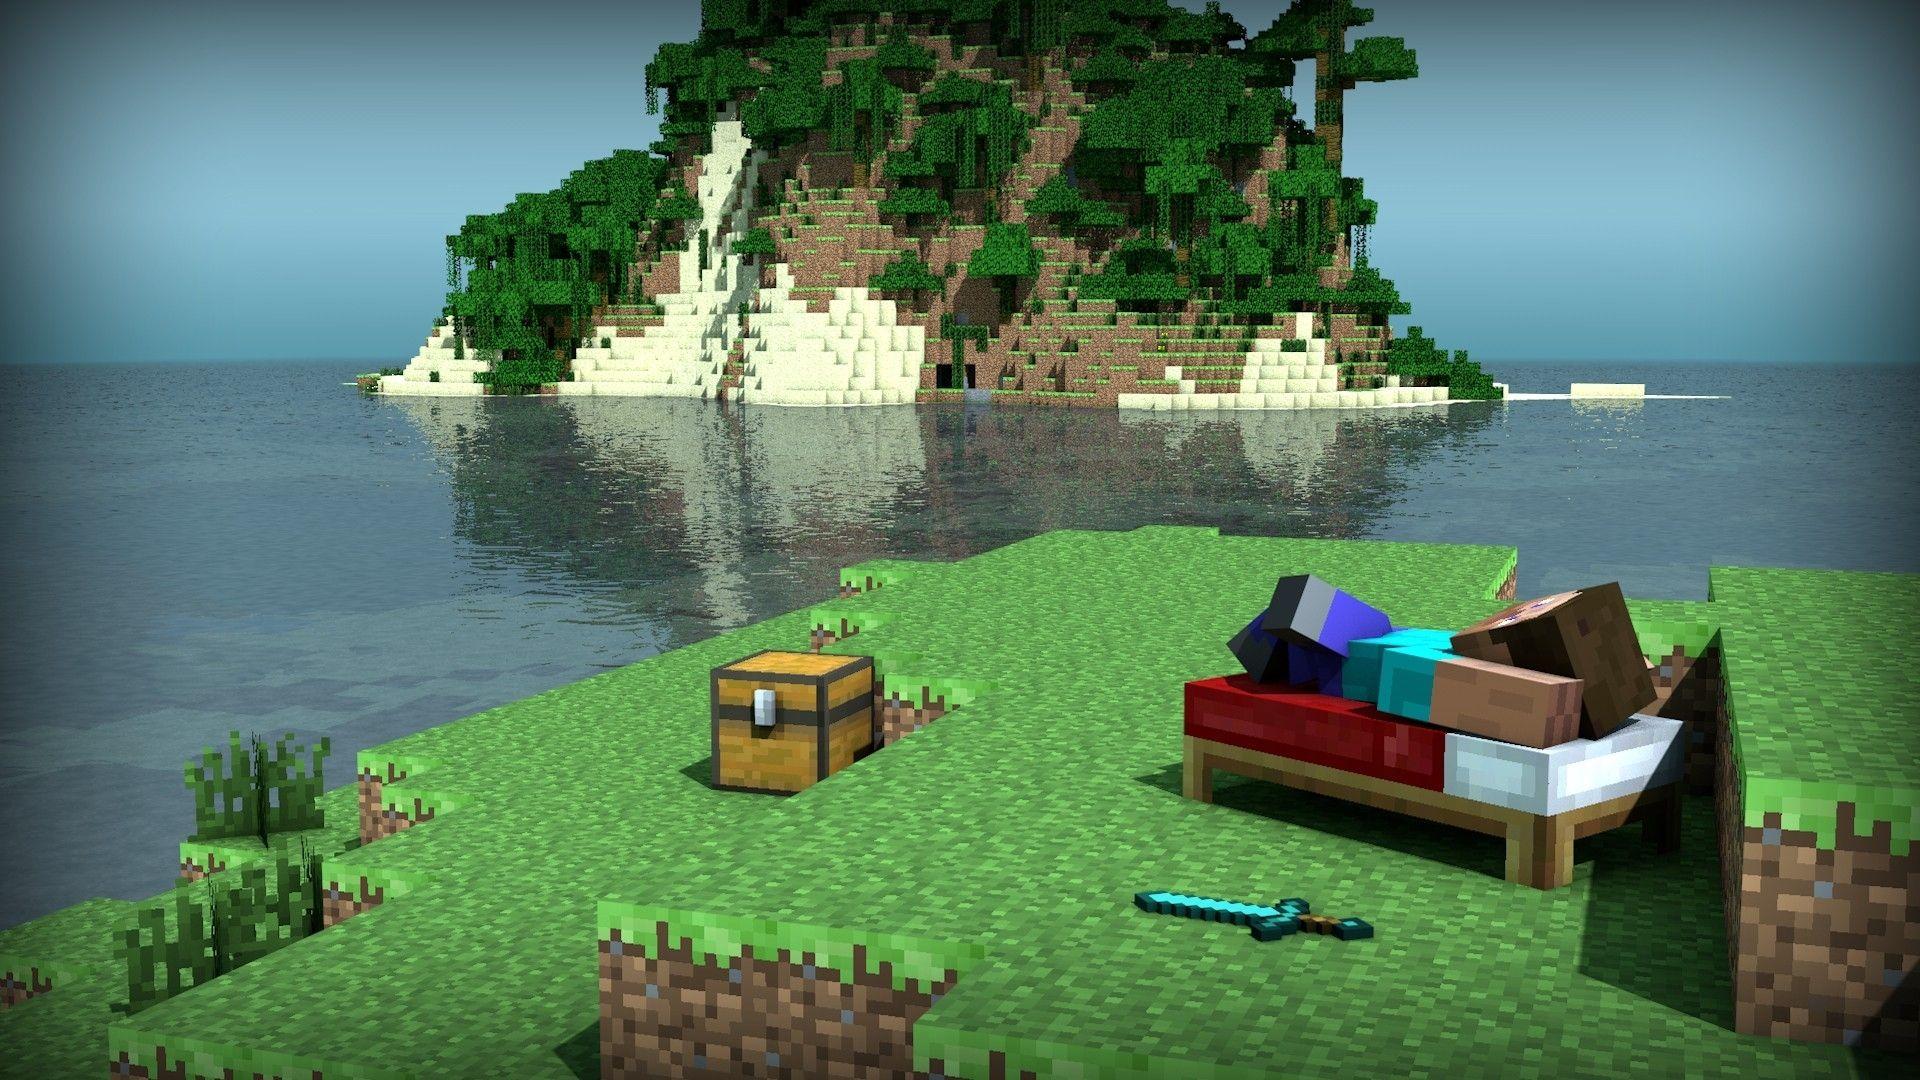 Minecraft Wallpaper For Bedroom Video Games Trees Wood Forest Beds Steve Islands Pixels Minecraft